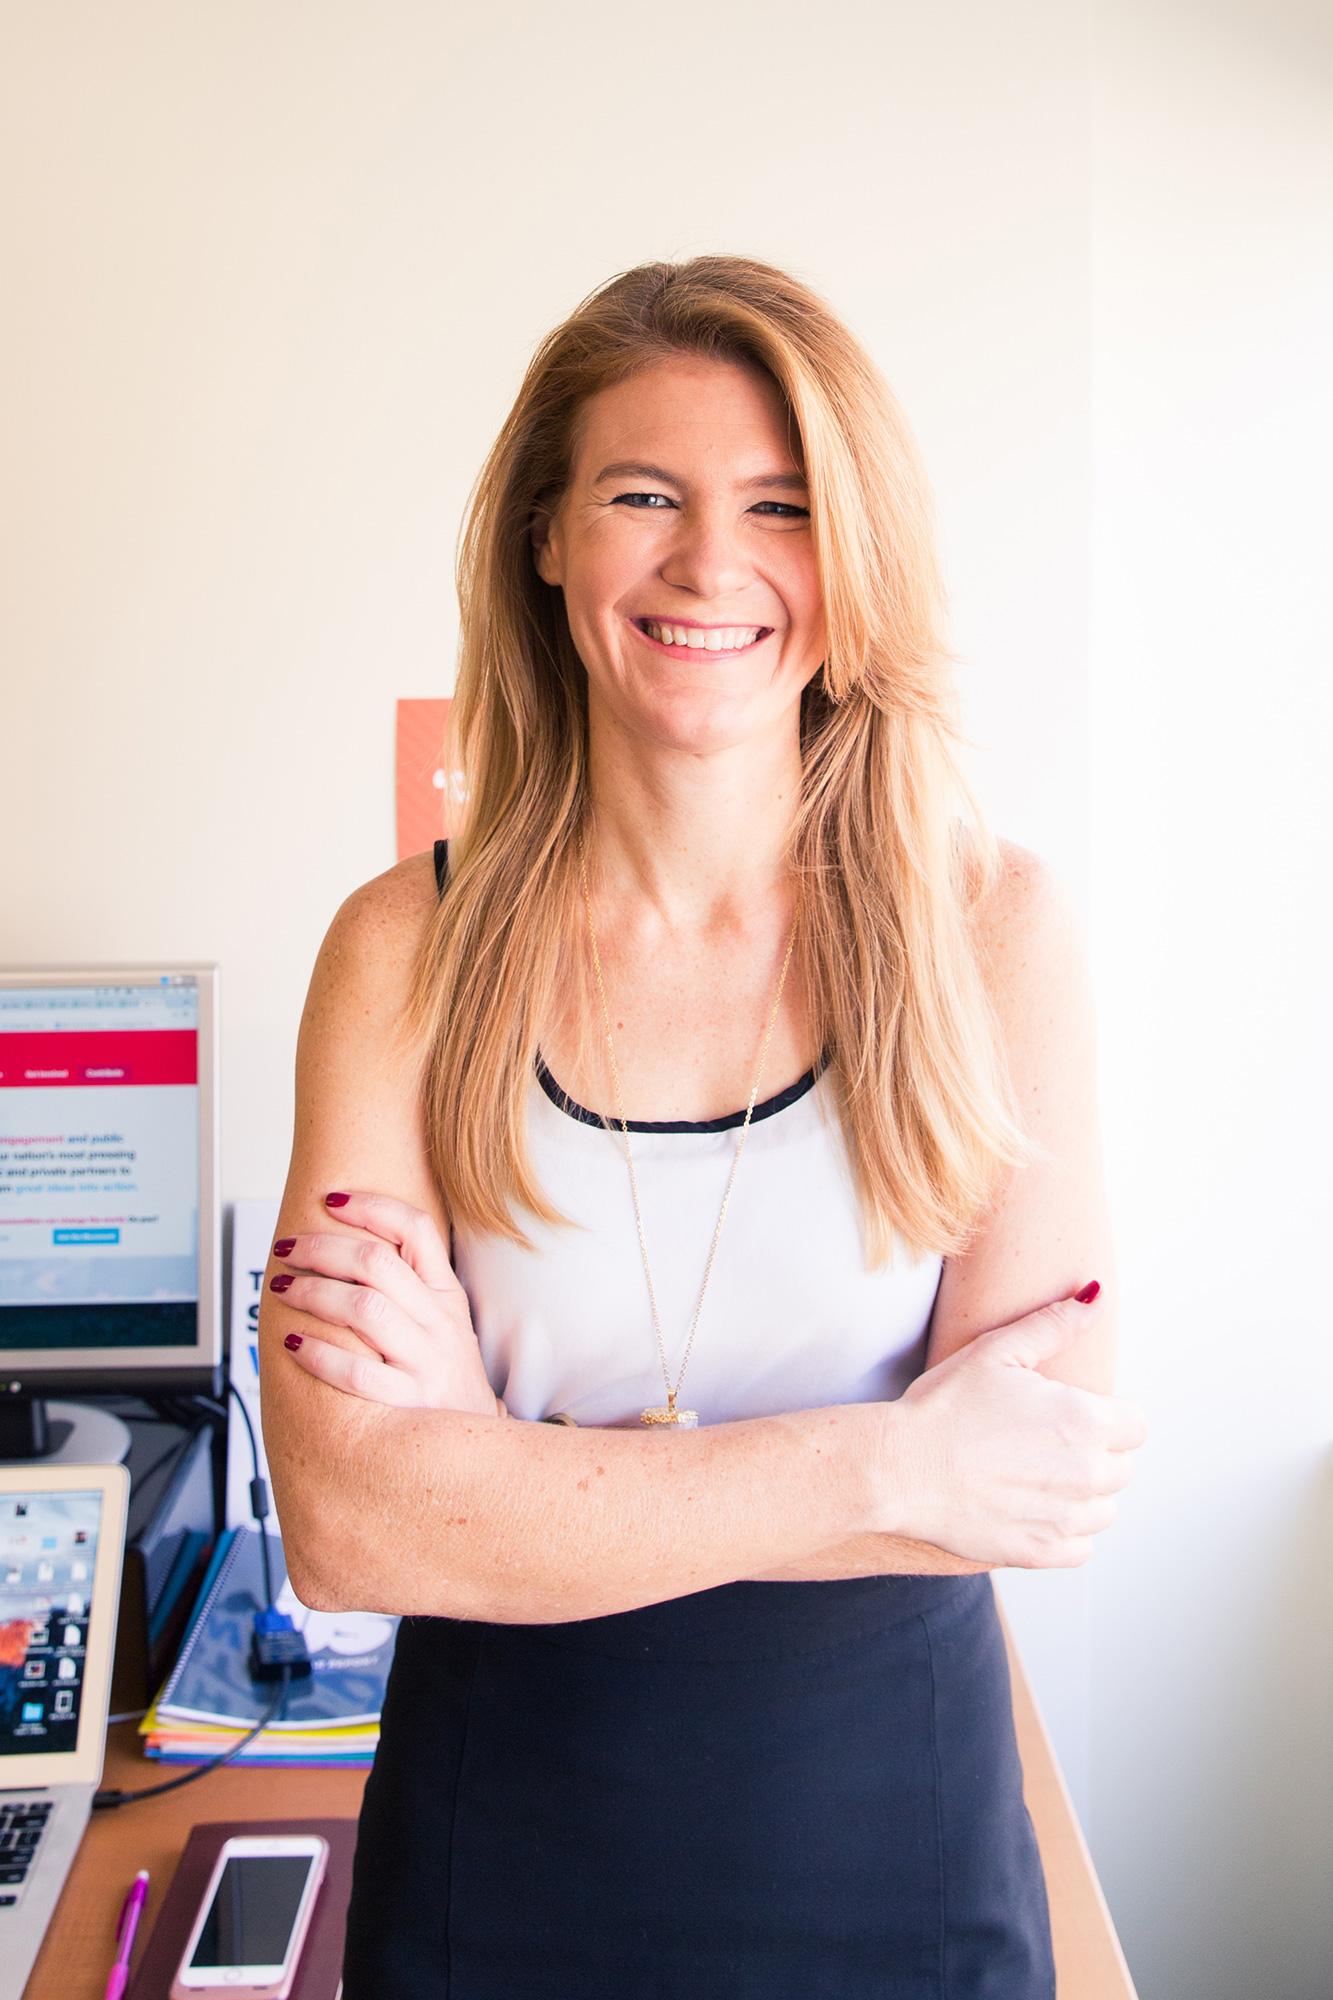 Communication on this topic: Paula Marshall, jenn-brown/